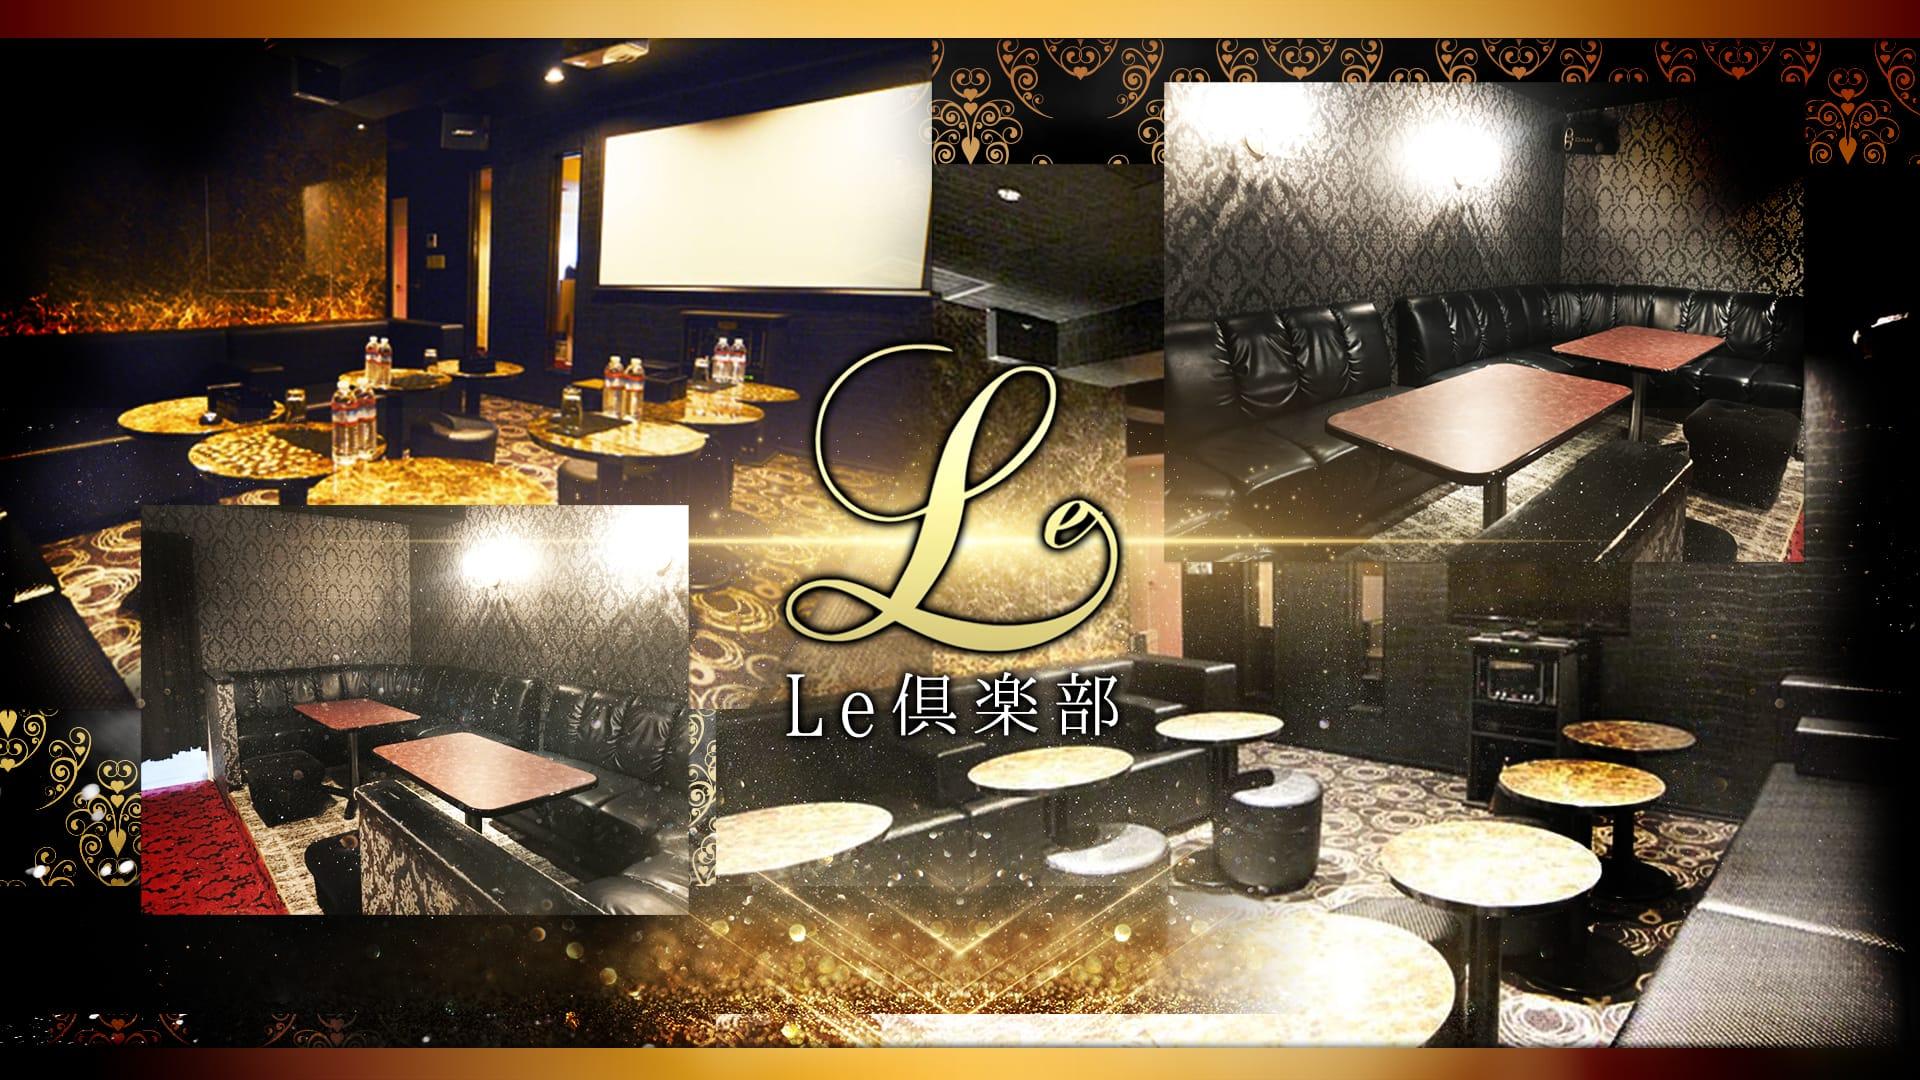 Le倶楽部(エル) 平塚キャバクラ TOP画像